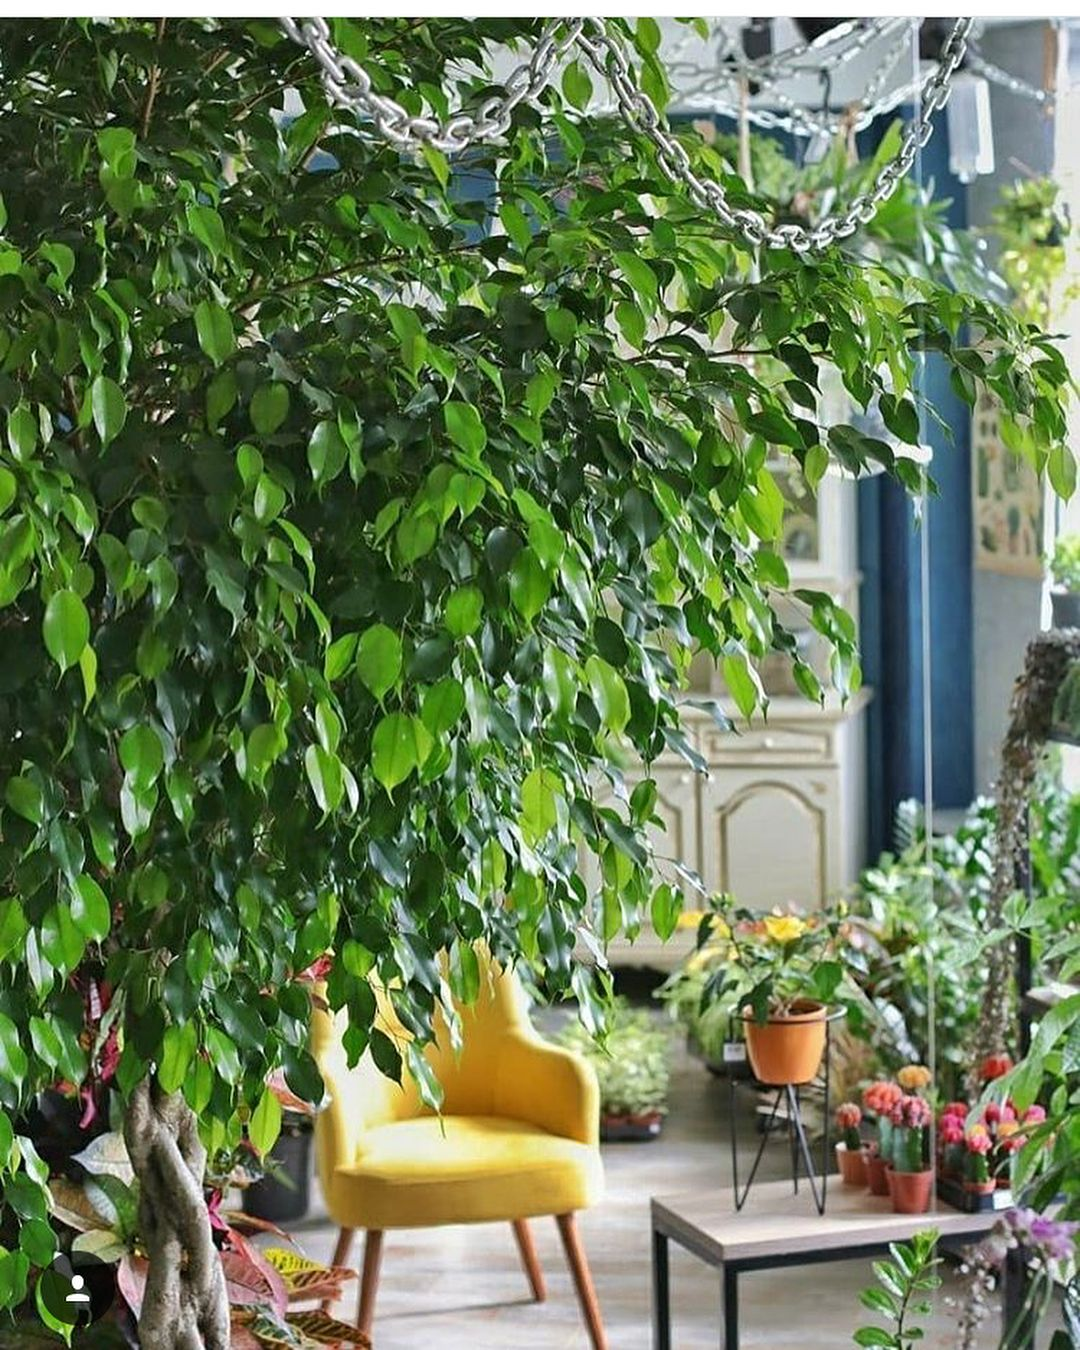 Come Riprodurre Il Ficus Benjamin ficus benjamina (with images) | indoor plants, planting